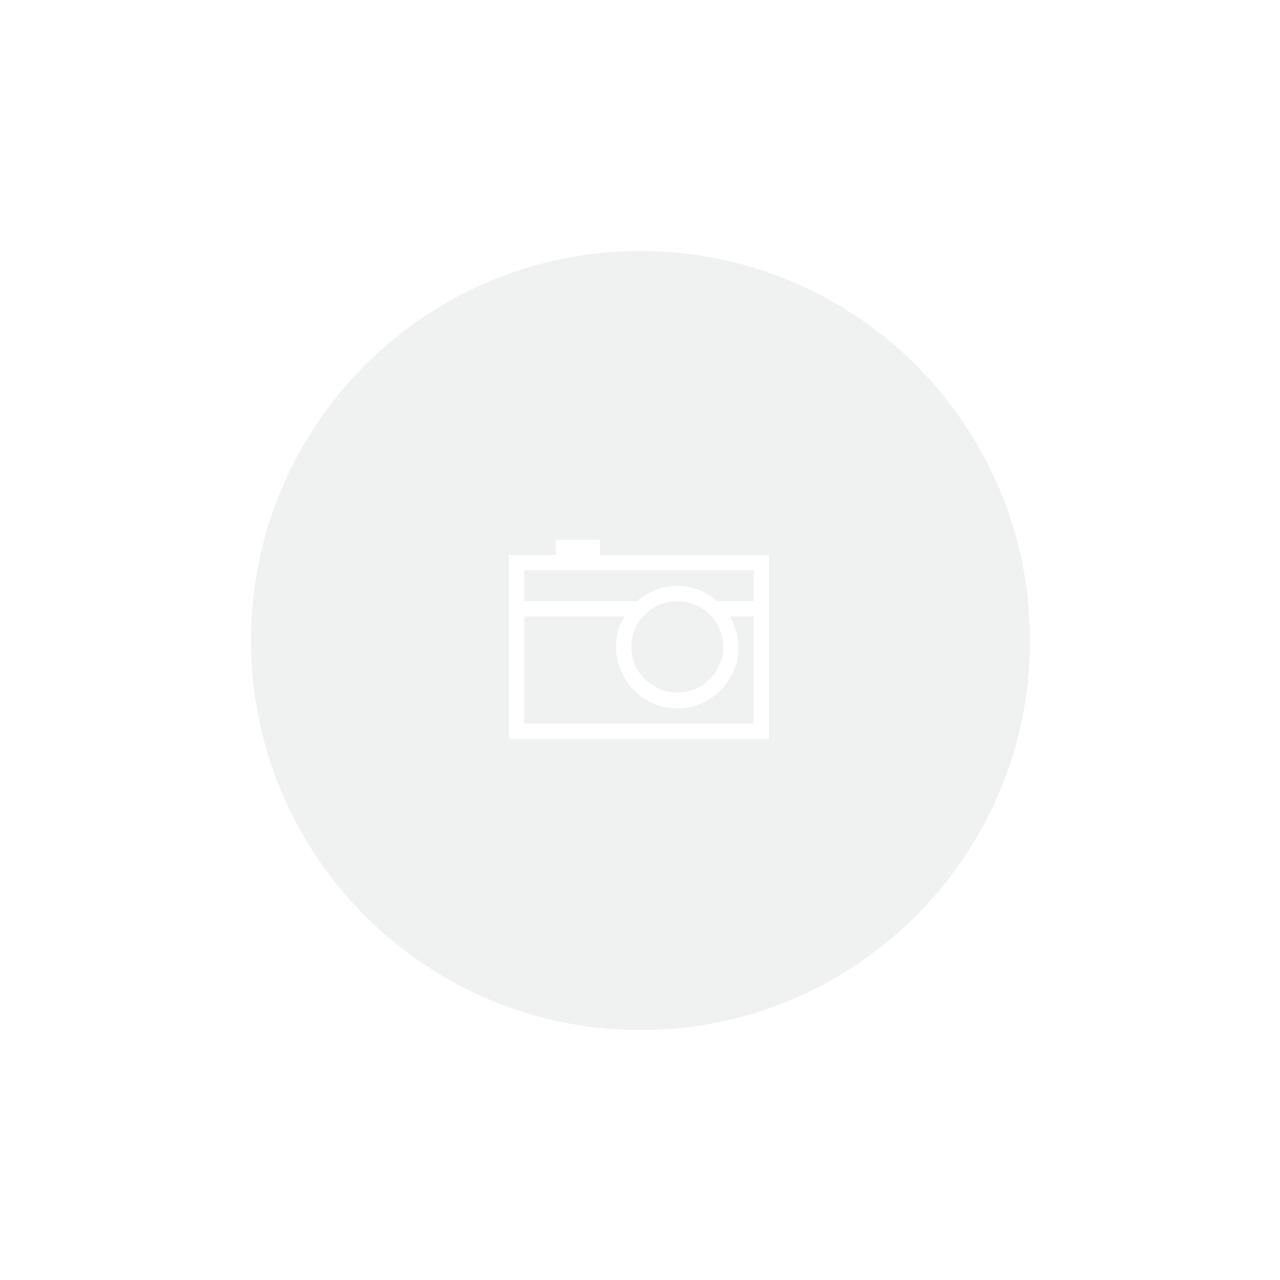 Cozi-Vapore Inox 20Cm 2,20 Litros Allegra Tramontina